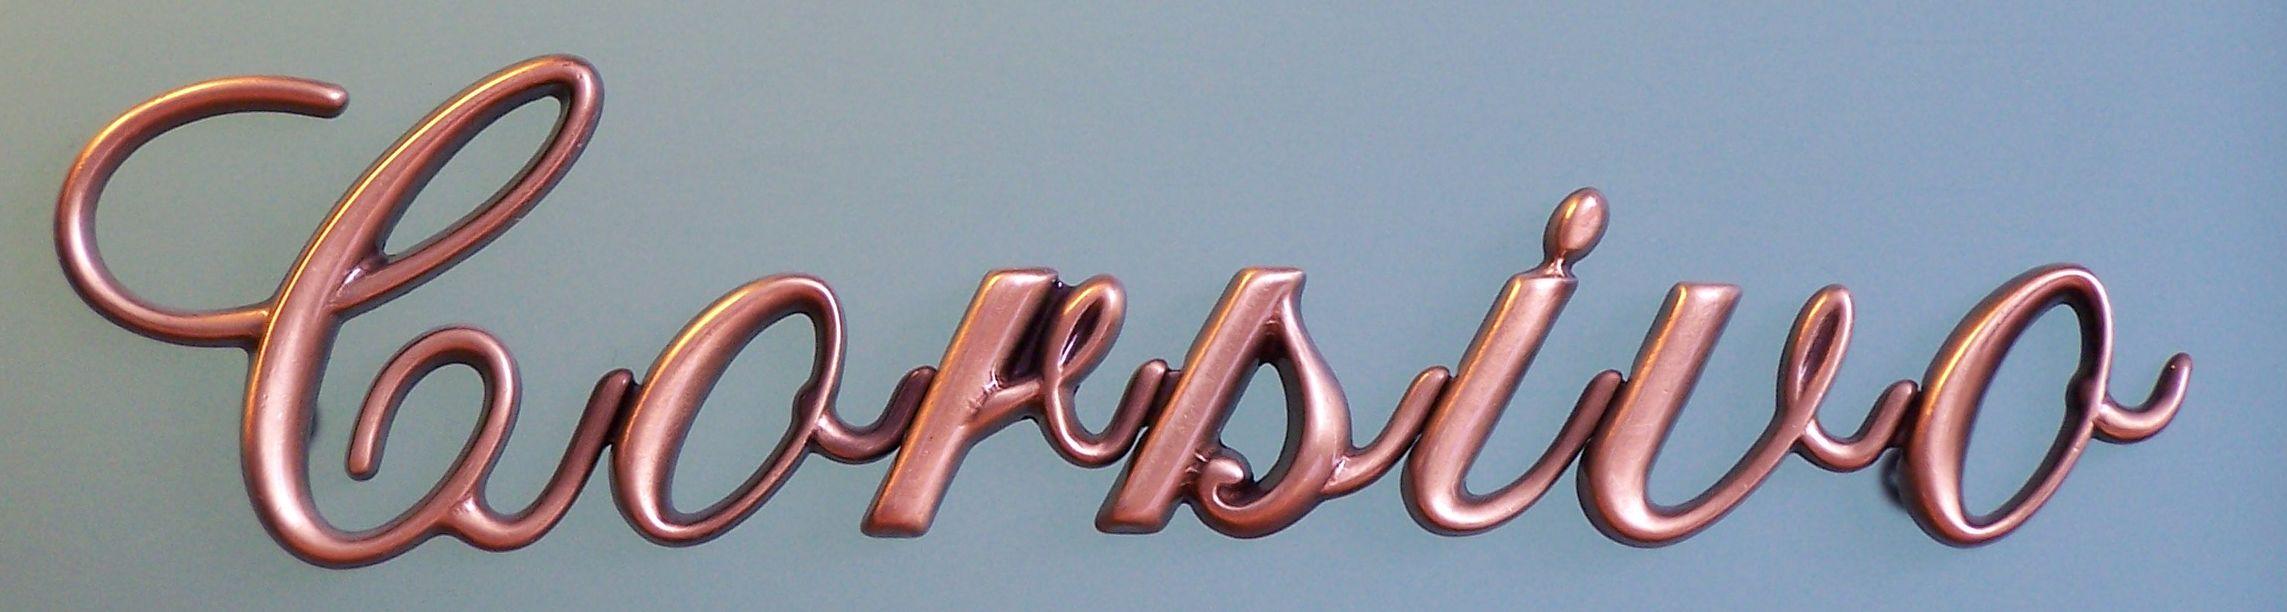 bronza-eu-Corsivo bronza.jpg